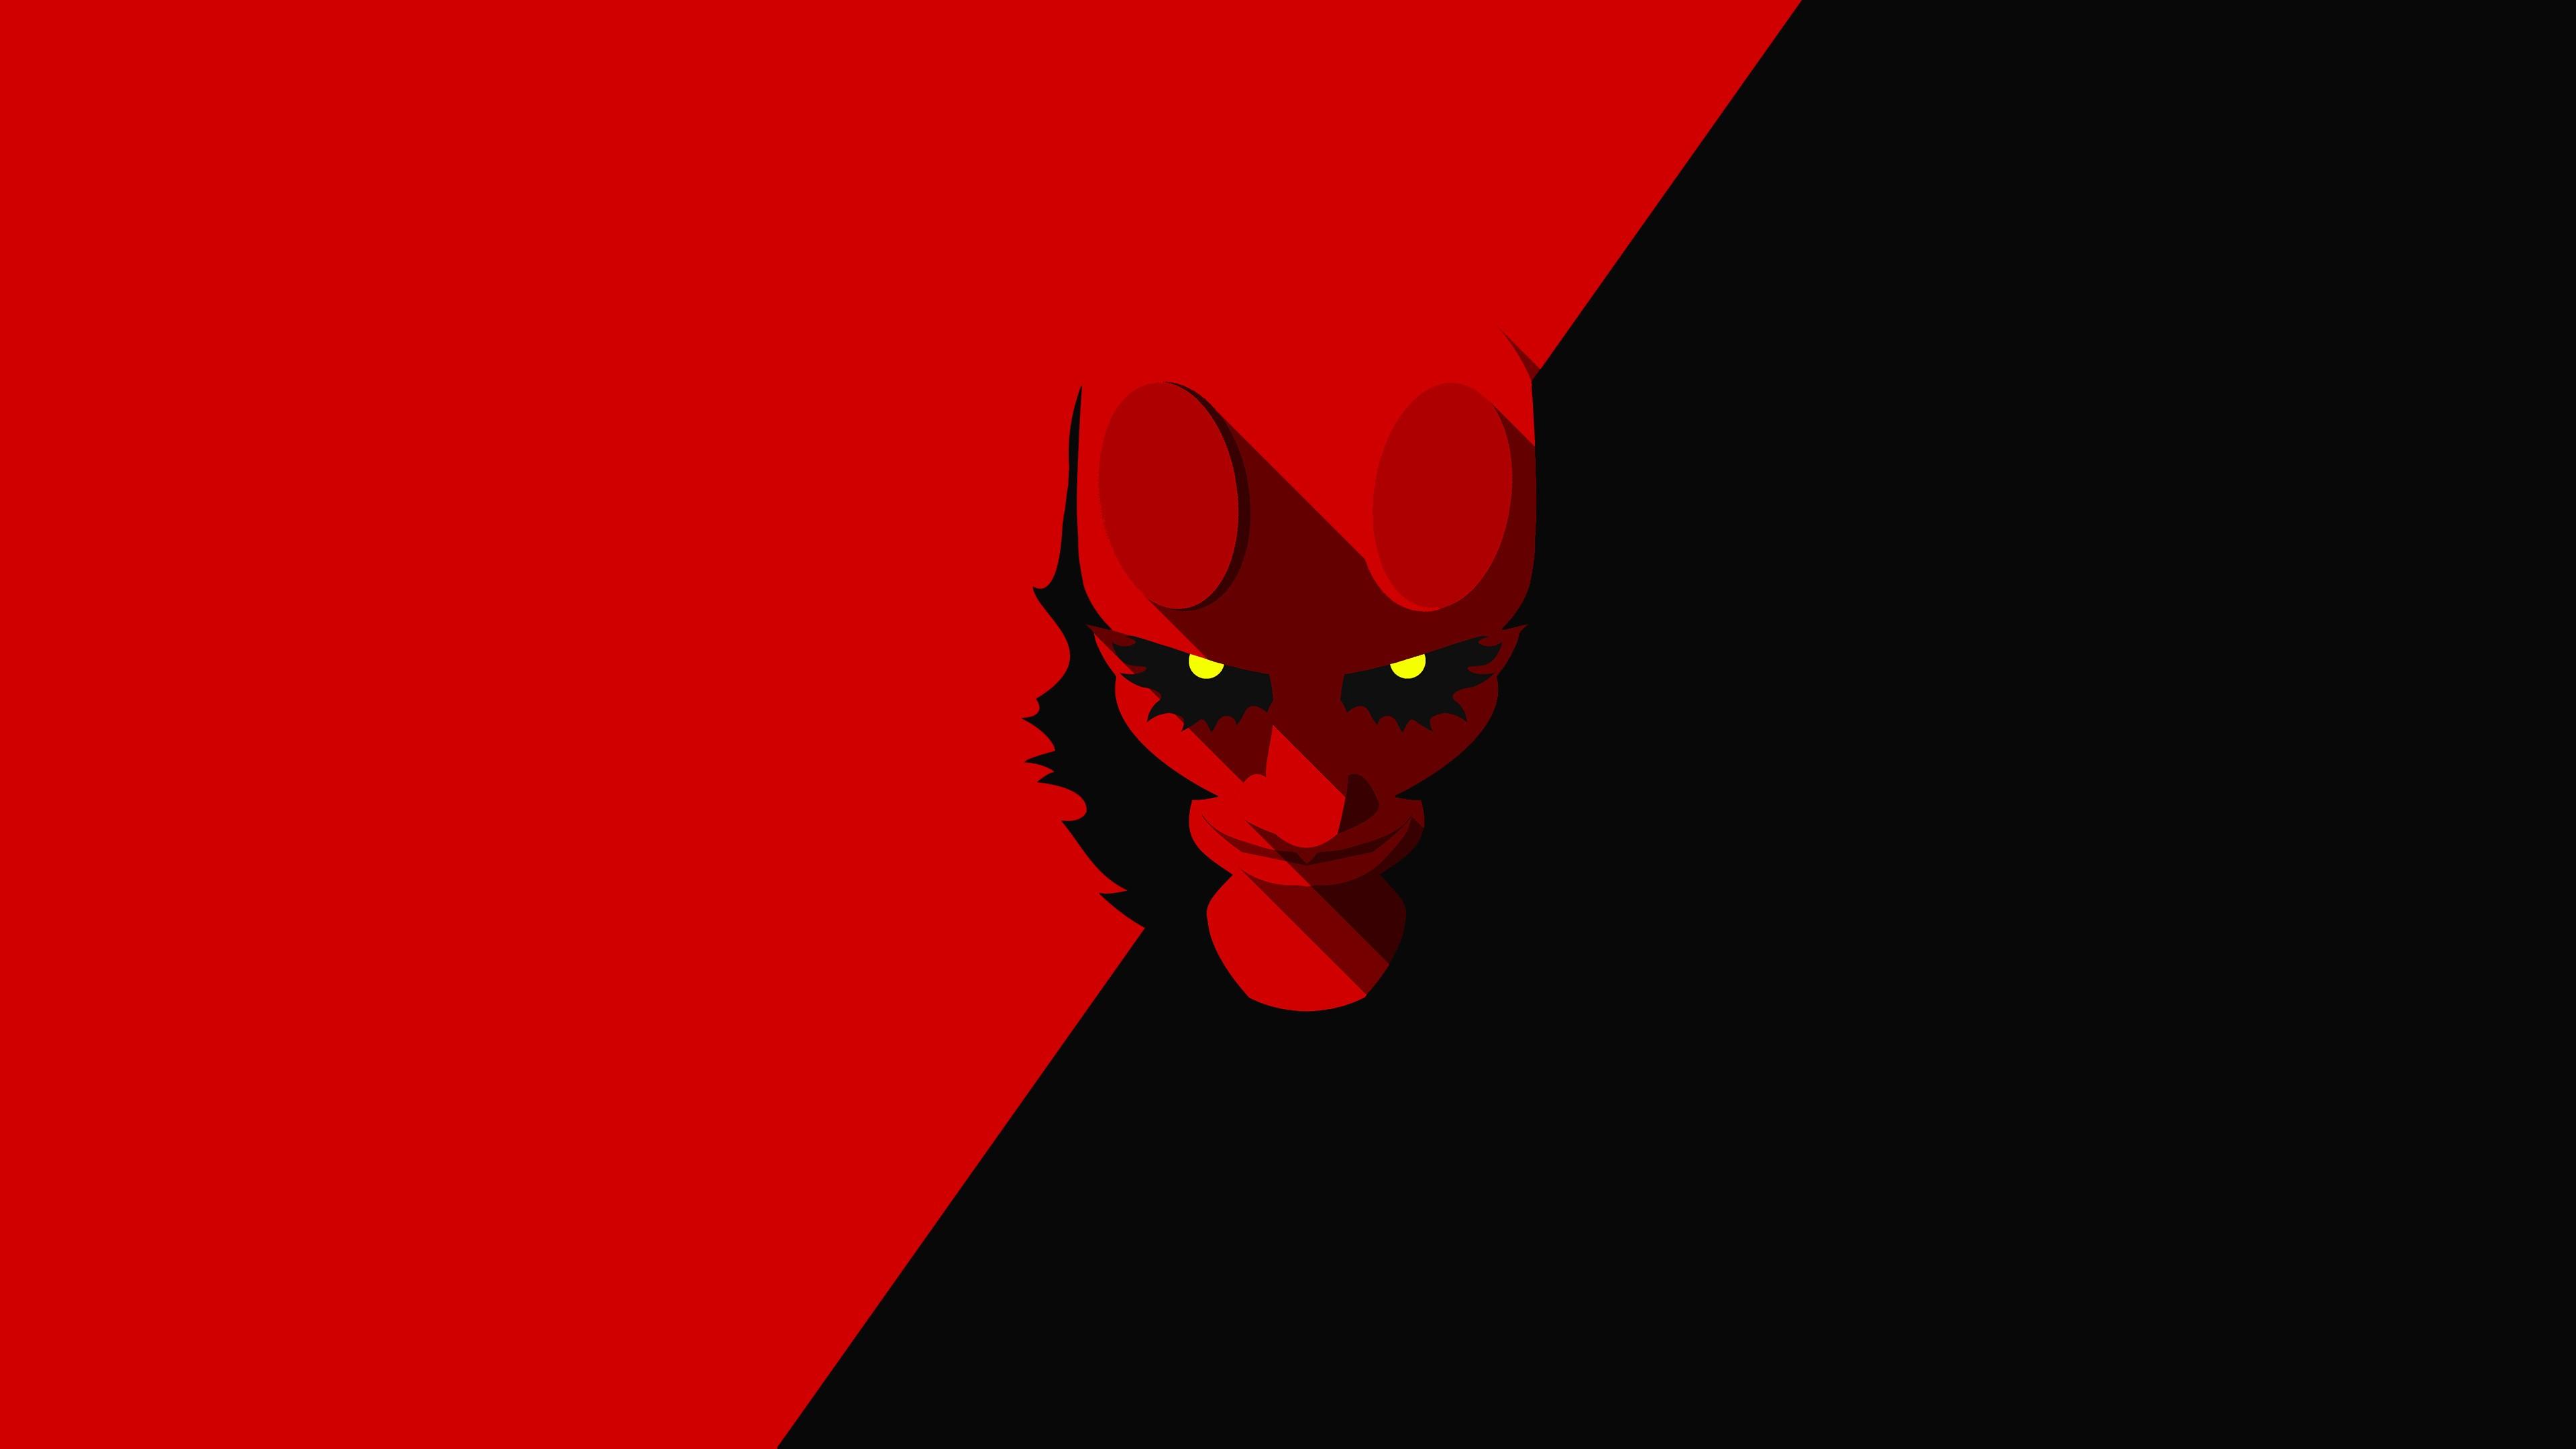 hellboy duvarkağıtları